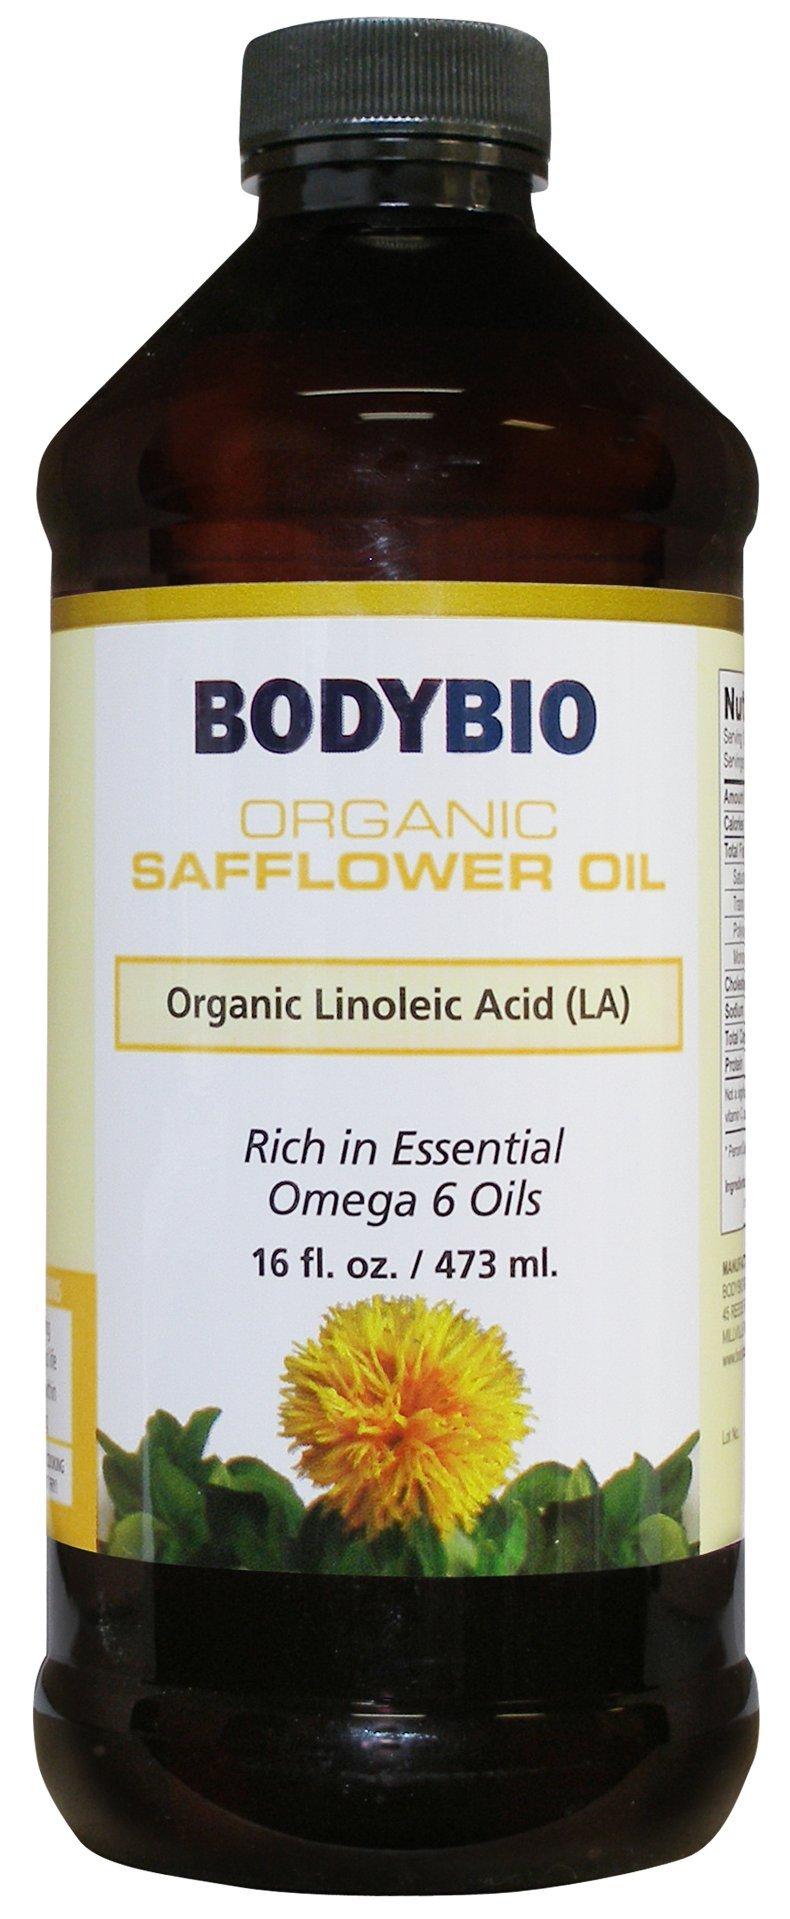 BodyBio - Organic Safflower Seed Oil - Unrefined, Cold Pressed, High Linoleic Acid, 16oz